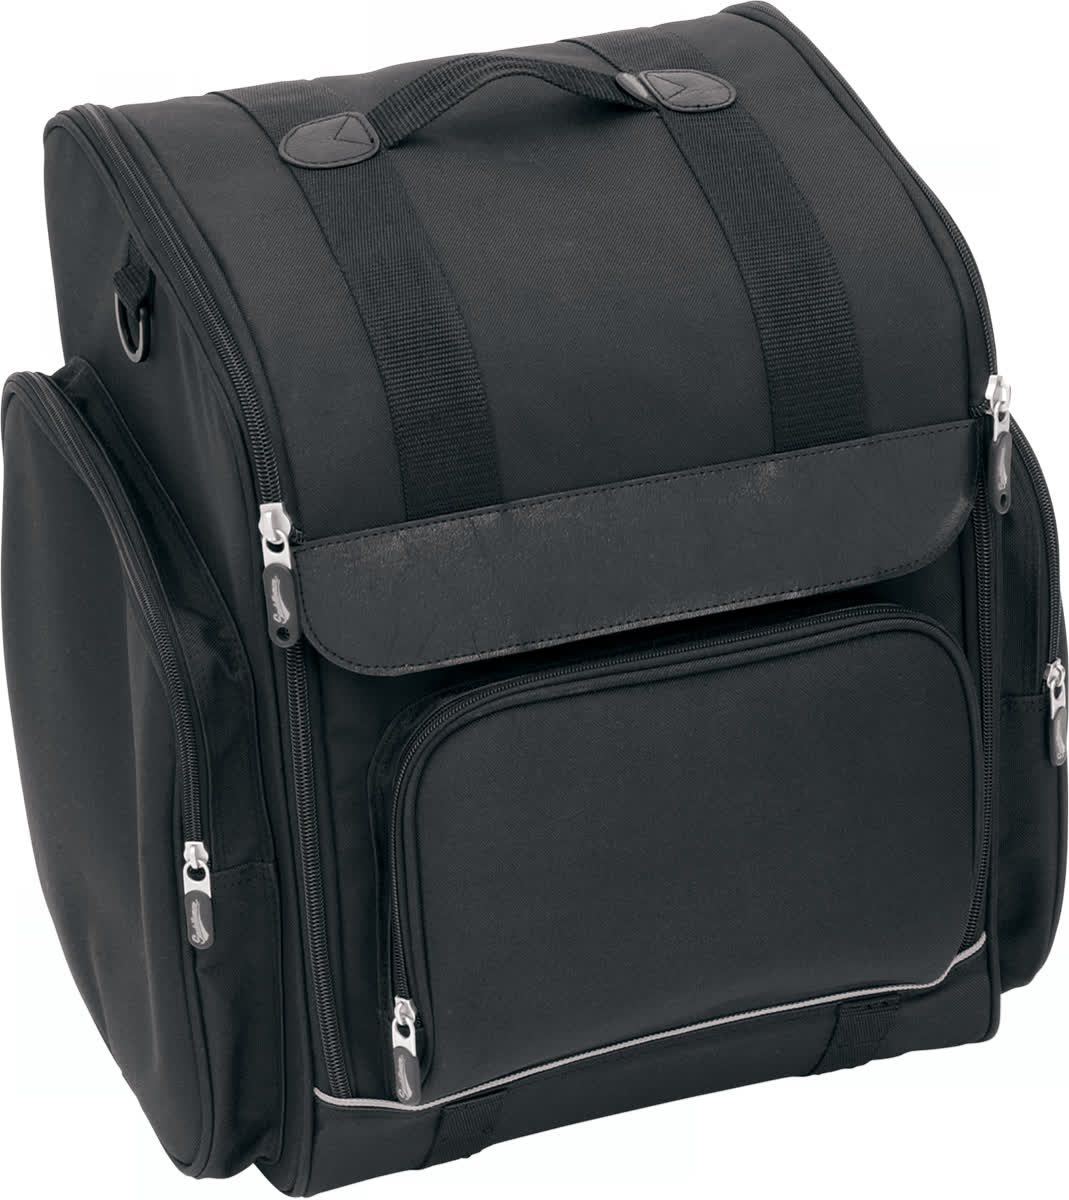 Saddlemen 3515-0078 SSR1900 Universal Bike Bag